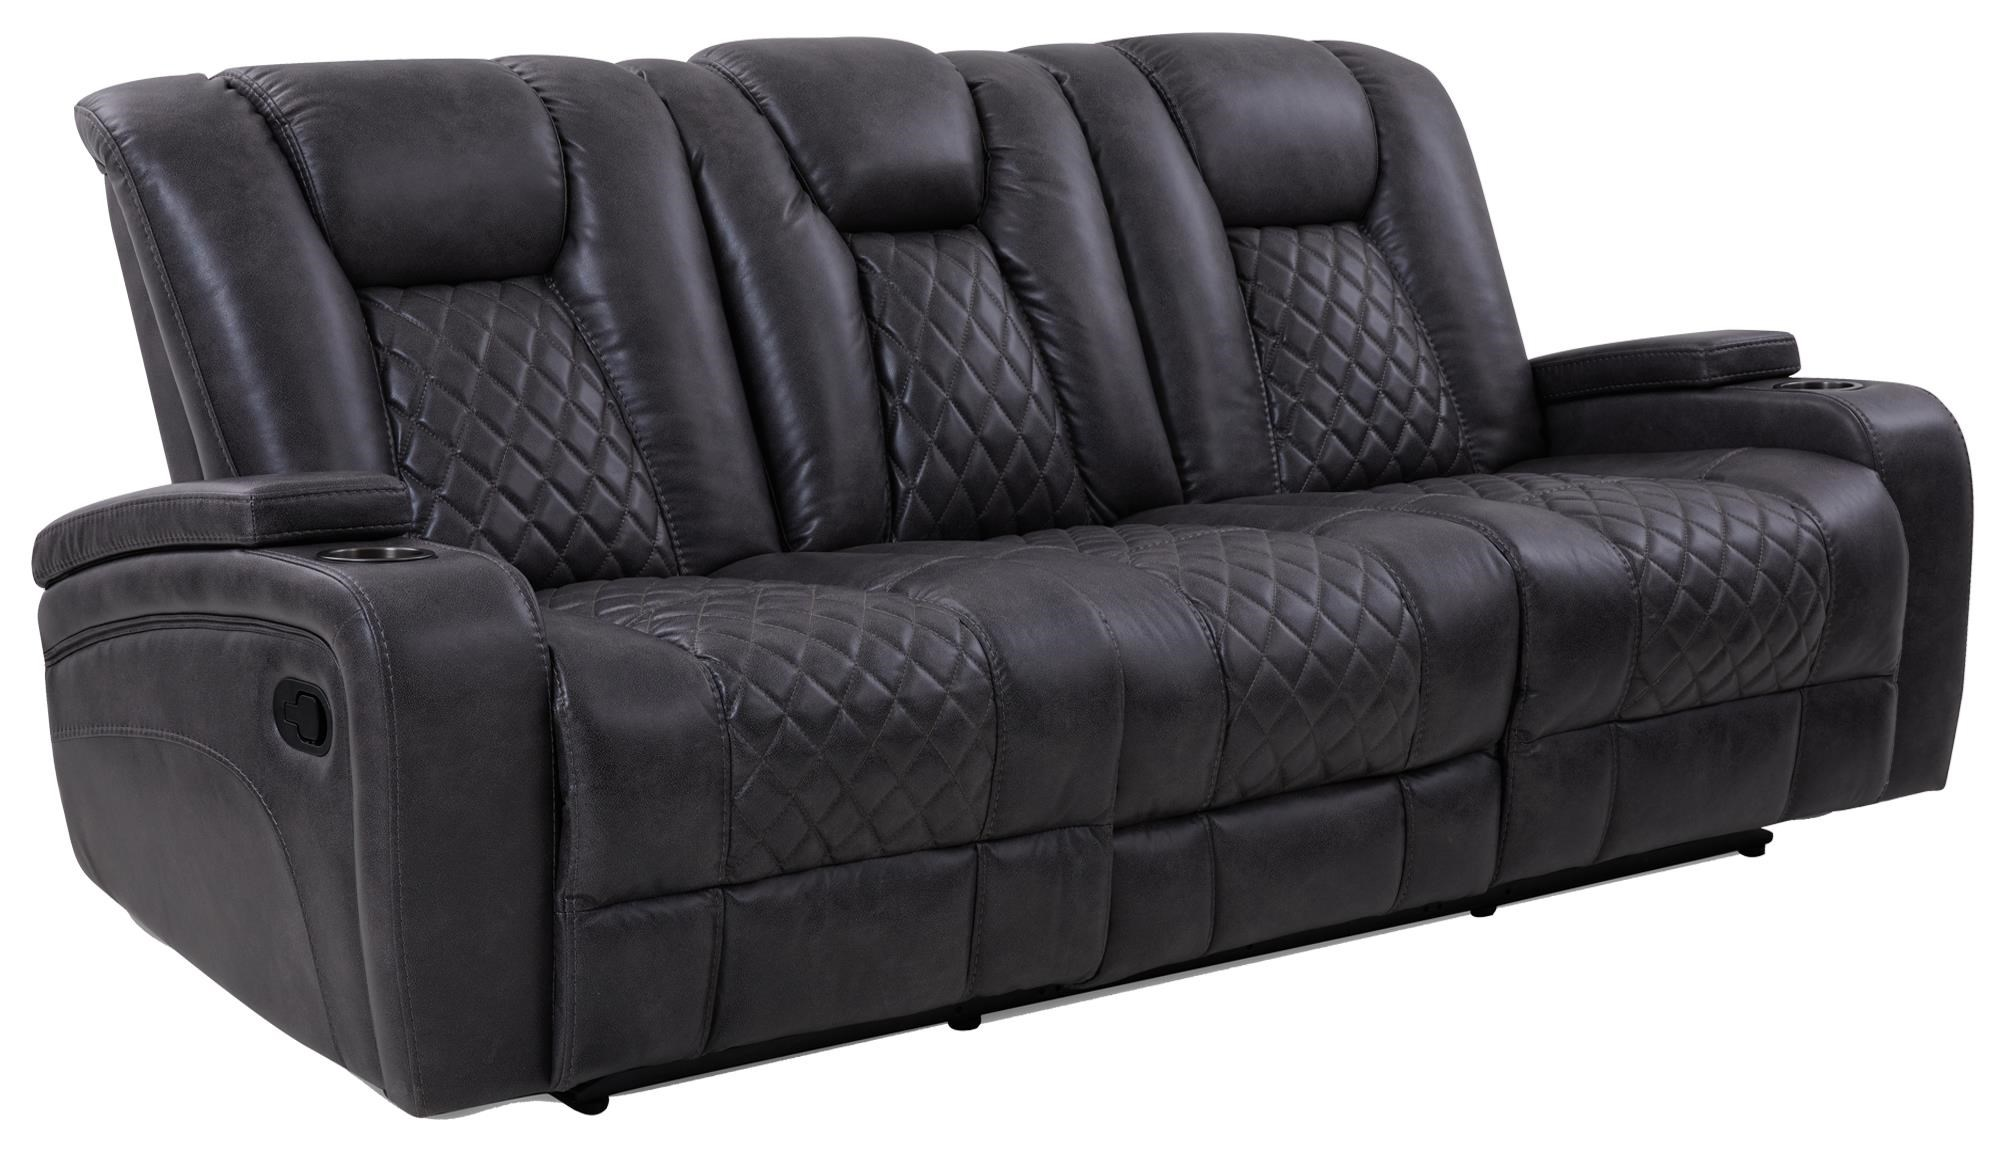 Reclining Sofa w/ Dropdown Table